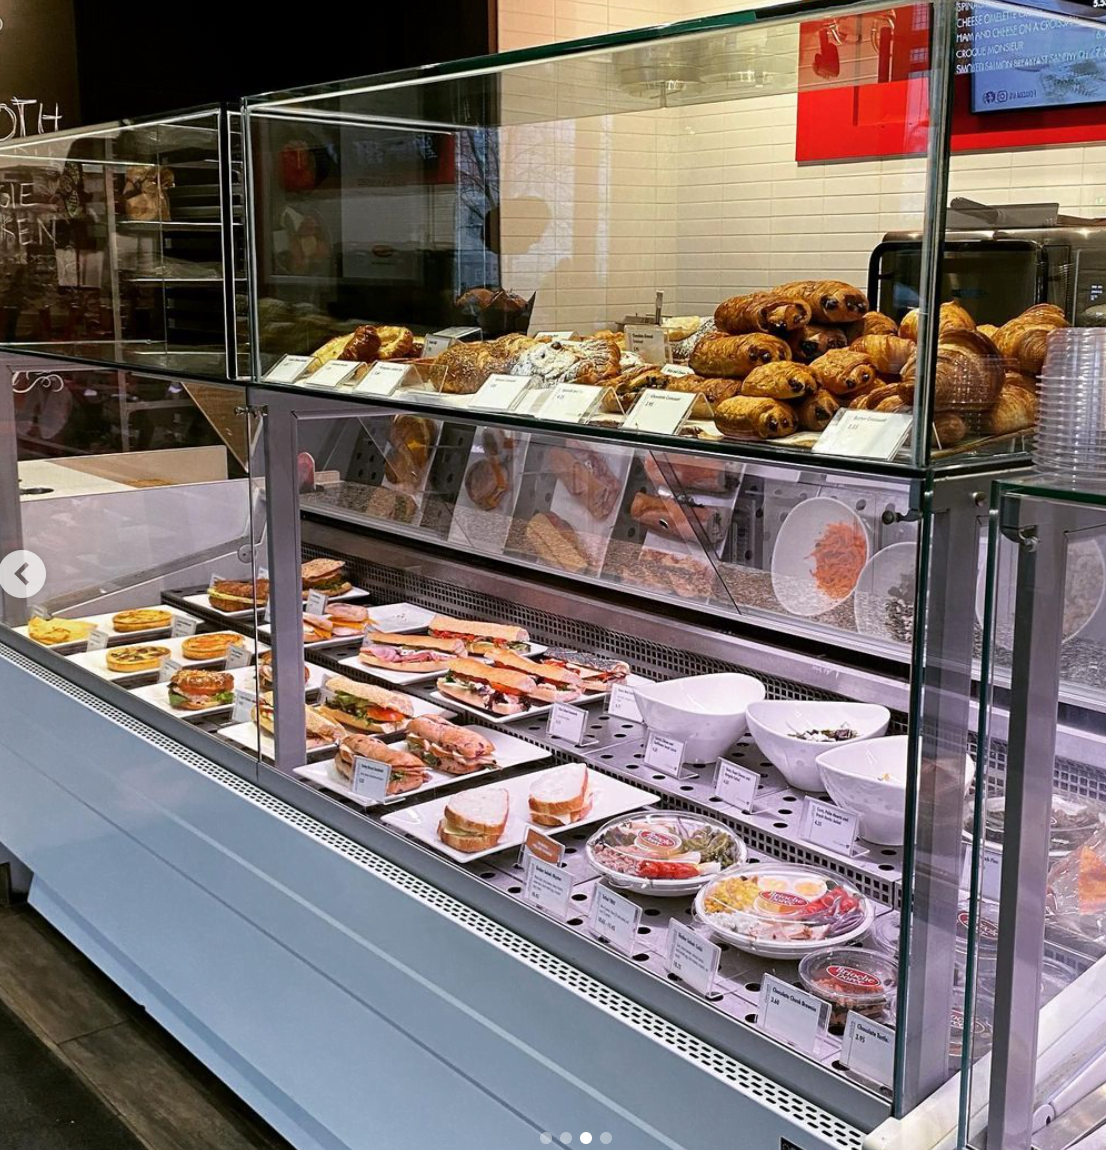 Interior of new Brioche Dorée location on Toronto's Bay Street showing pastry lineup. Photo: Brioche Dorée Instagram